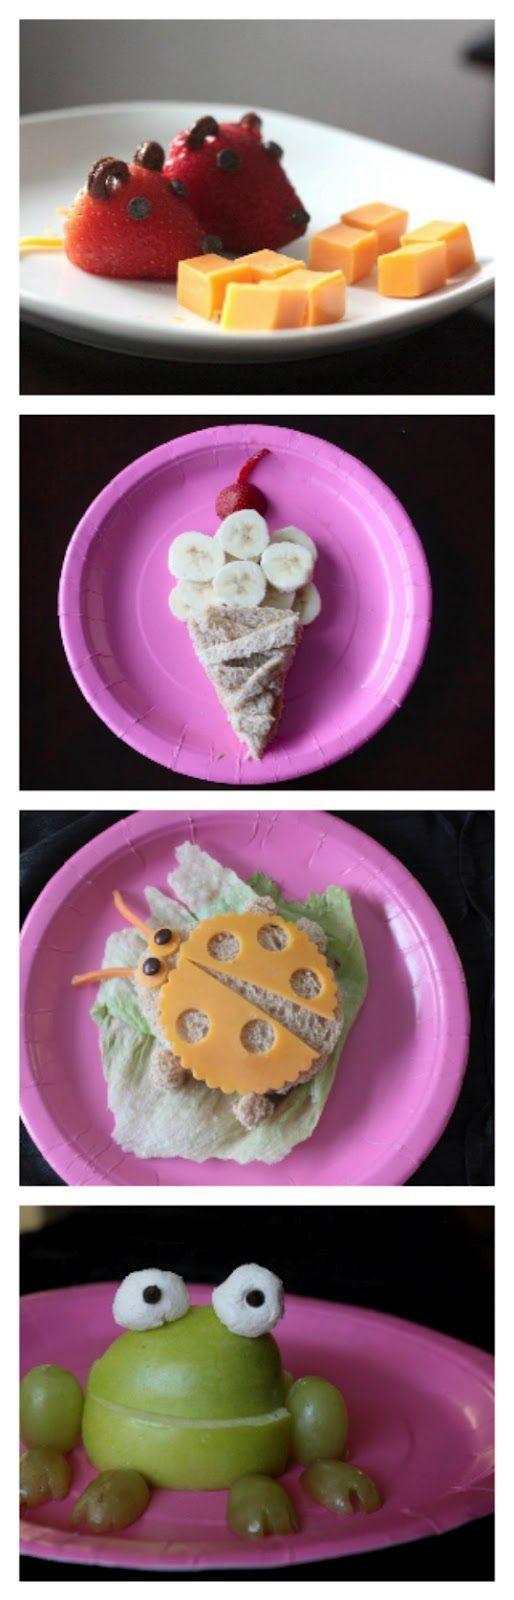 /lauracryan/ Fun food for kids - Momma Hen's Kitchen